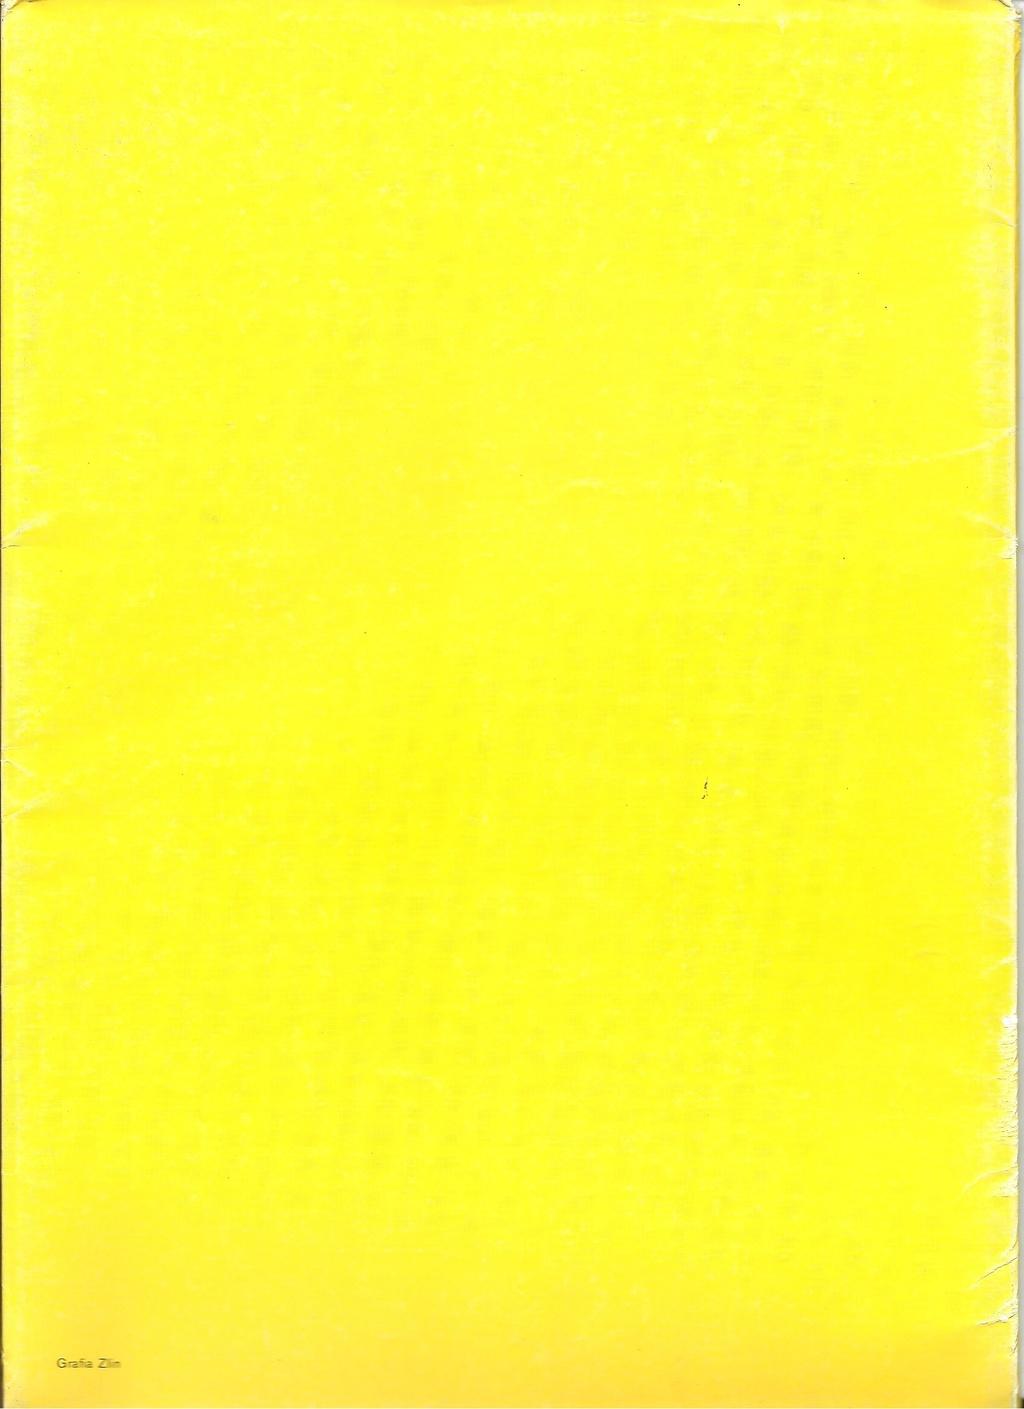 [KOVOZAVODY 199.] Catalogue 199.  Kovoza81